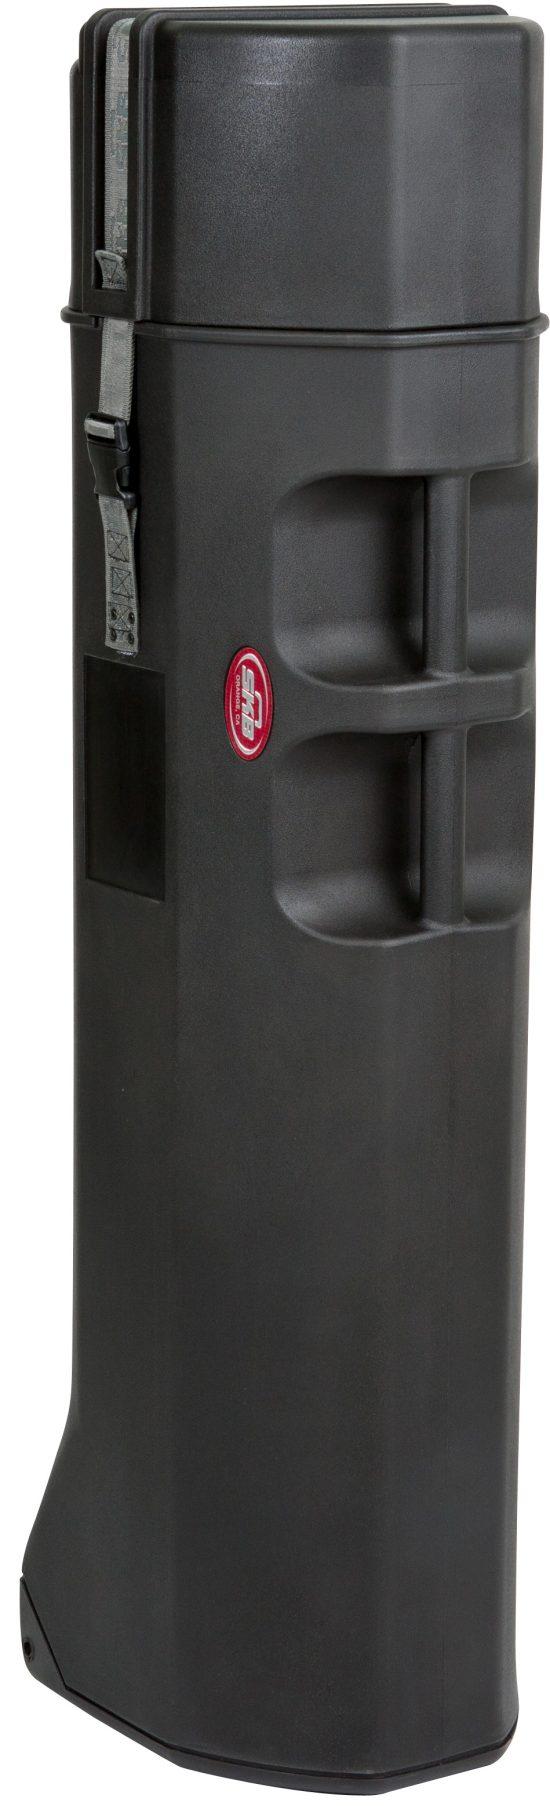 SKB 1SKB-R4611W Case - Foam Example